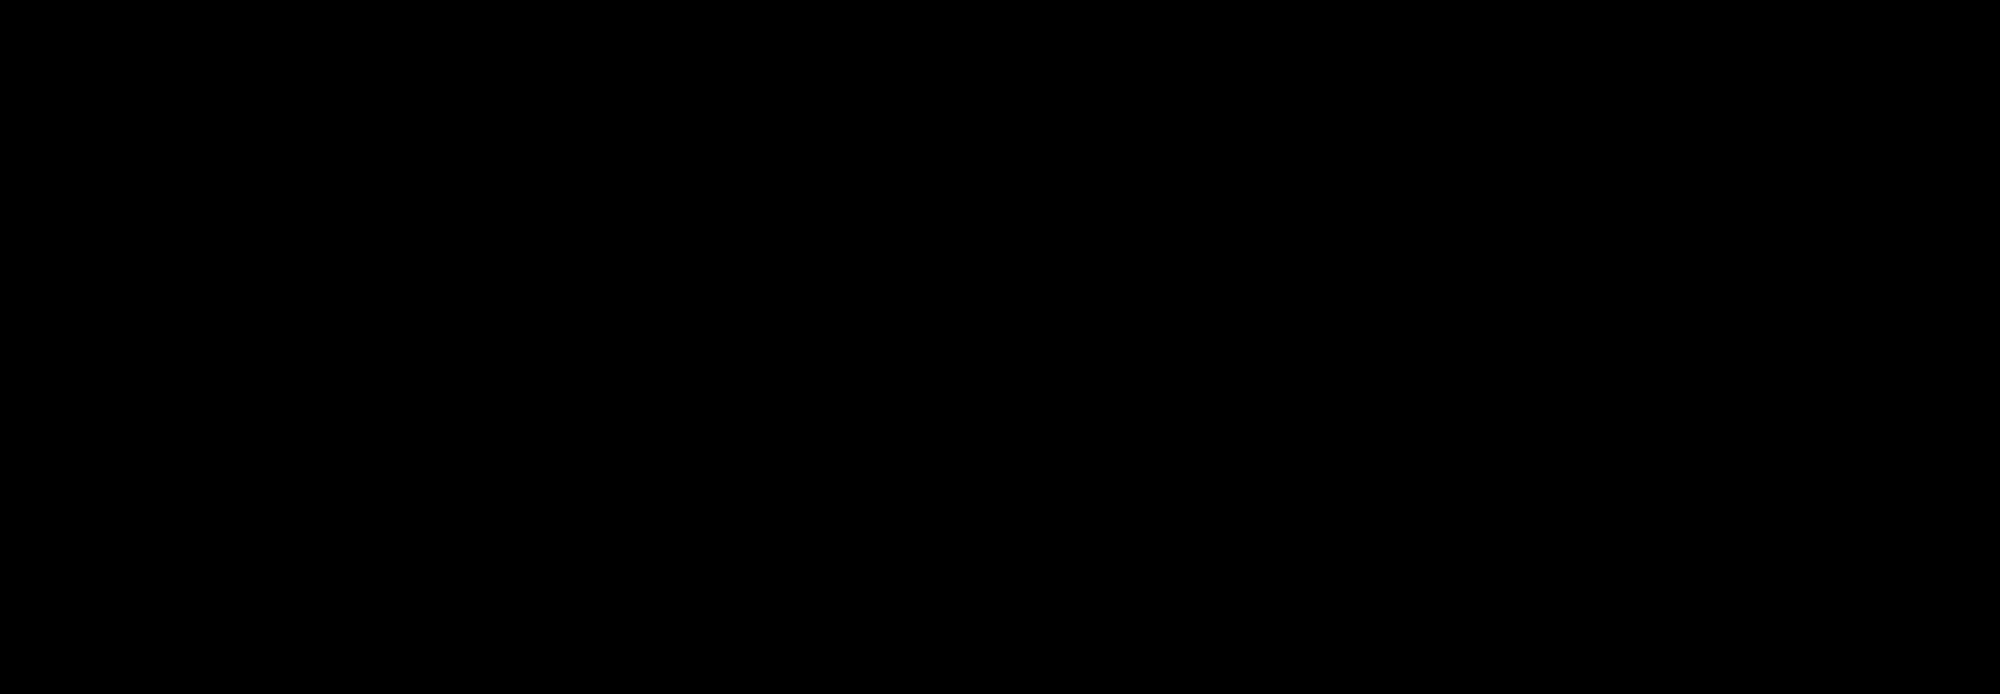 Blissful 2 Be Weddings -logo-black.png